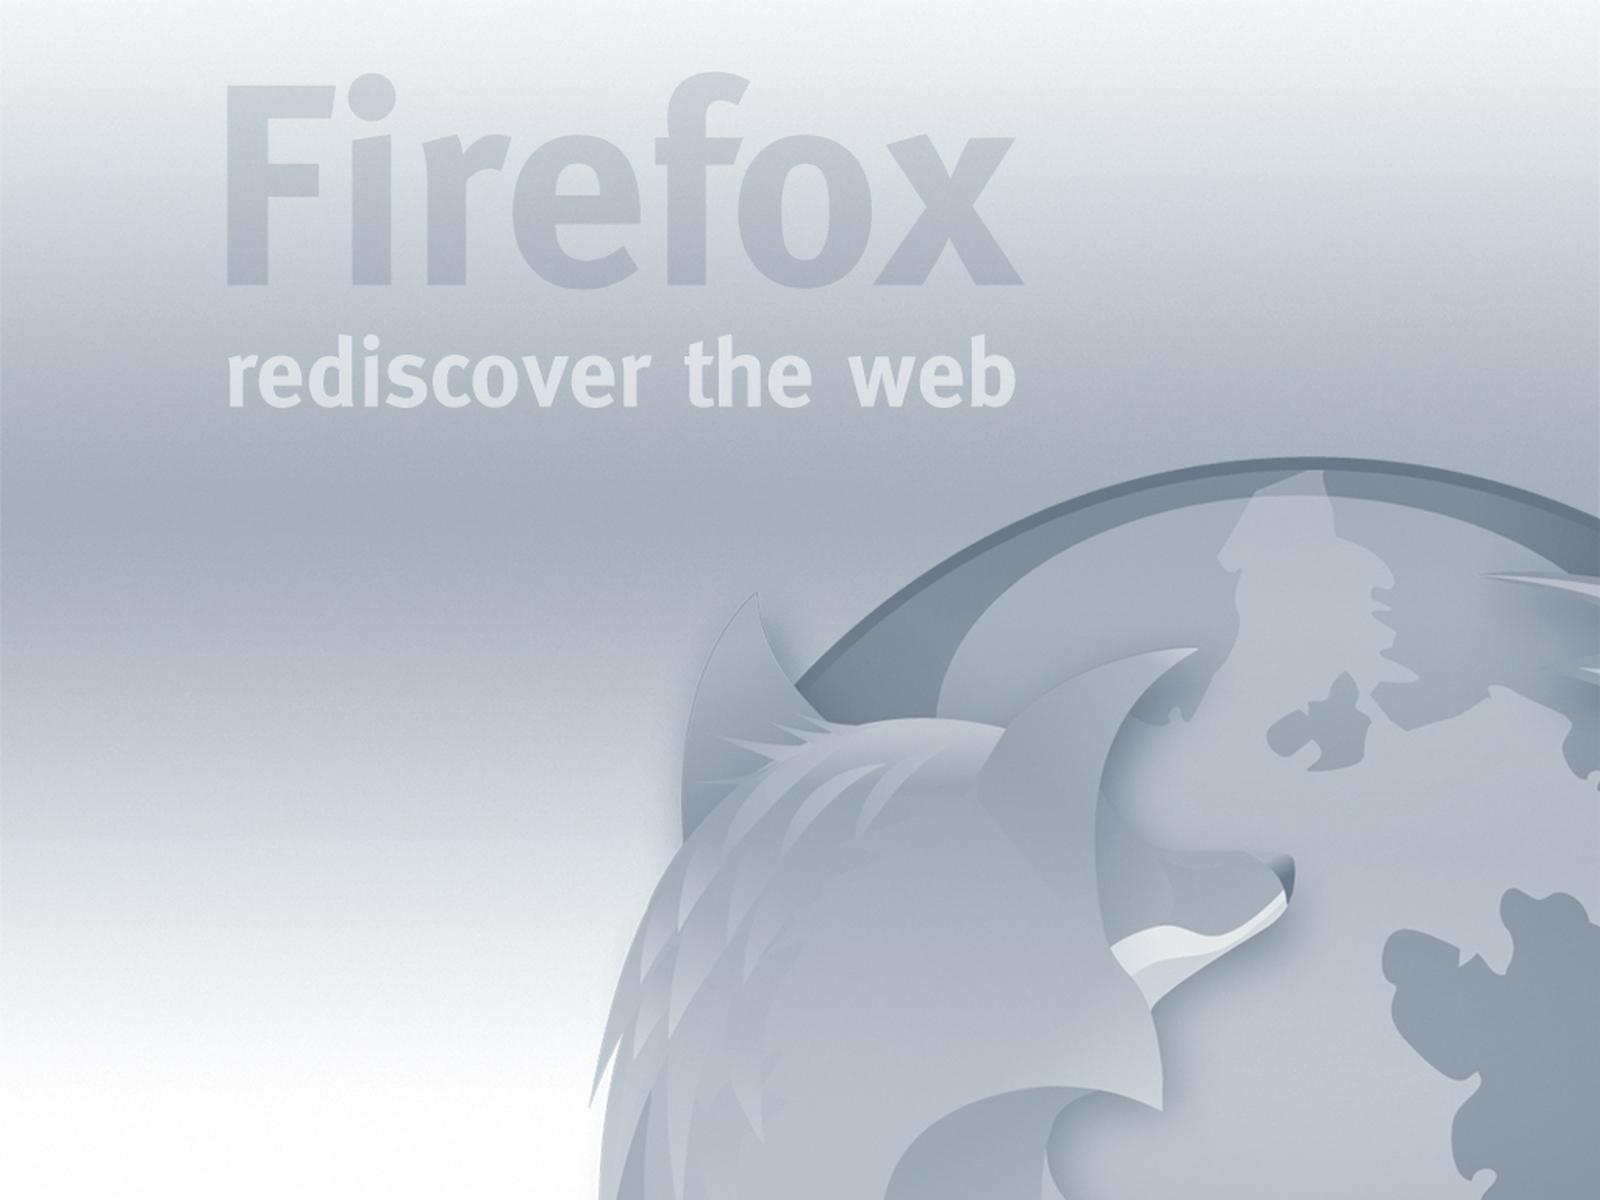 http://2.bp.blogspot.com/_ASJySITosOE/TLFjBpLrXBI/AAAAAAAAA1Q/xYVP6CcrKFM/s1600/Firefox+Wallpaper_40.jpg